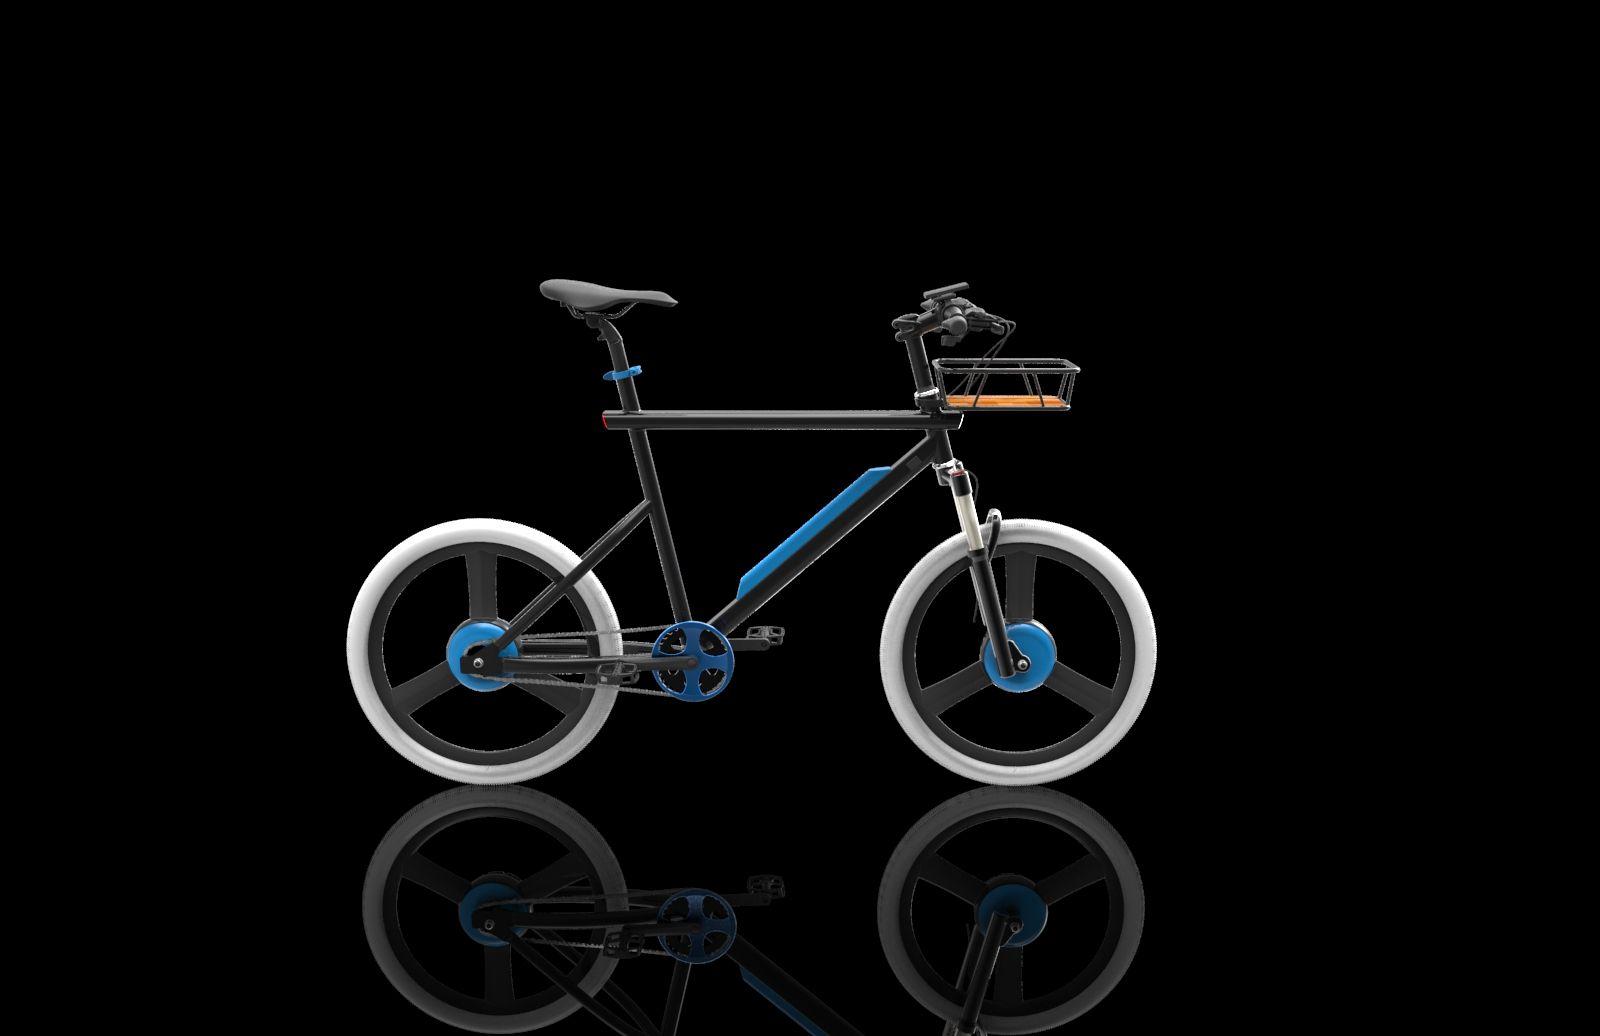 Reconbike Ebike Indiegogo Recon Reconbike Bicycles Ebikes Electricbike Mtb Mountainbike Foldingbike Ebike Qelectri Electric Bicycle Ebike Bicycle